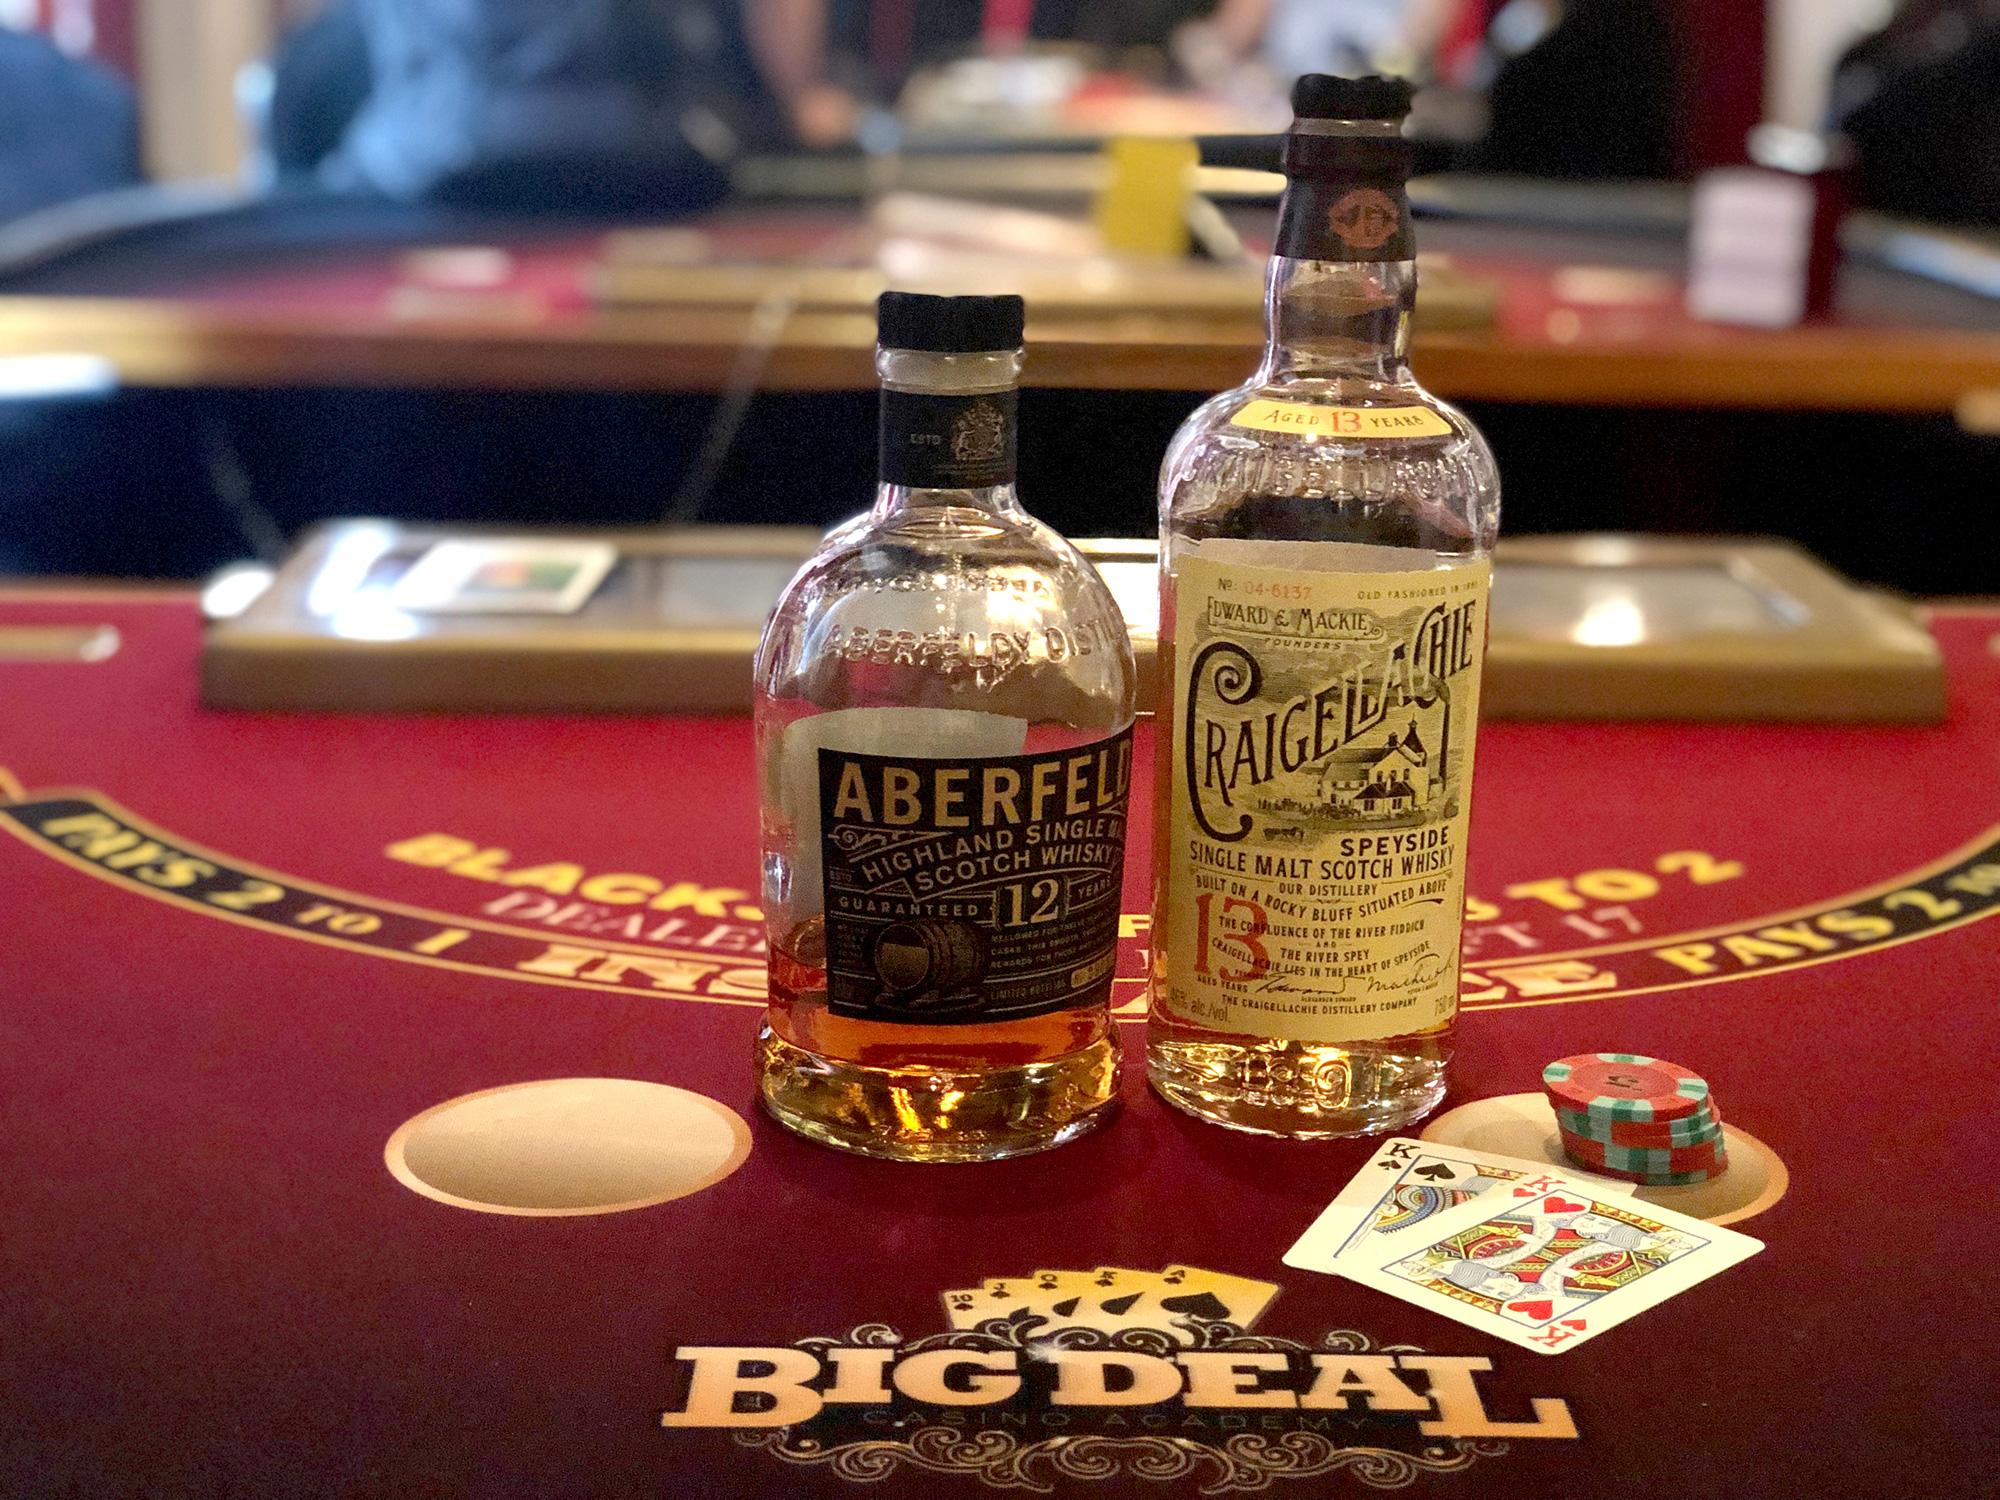 Scotch bottles at Casino-psdLR.jpg